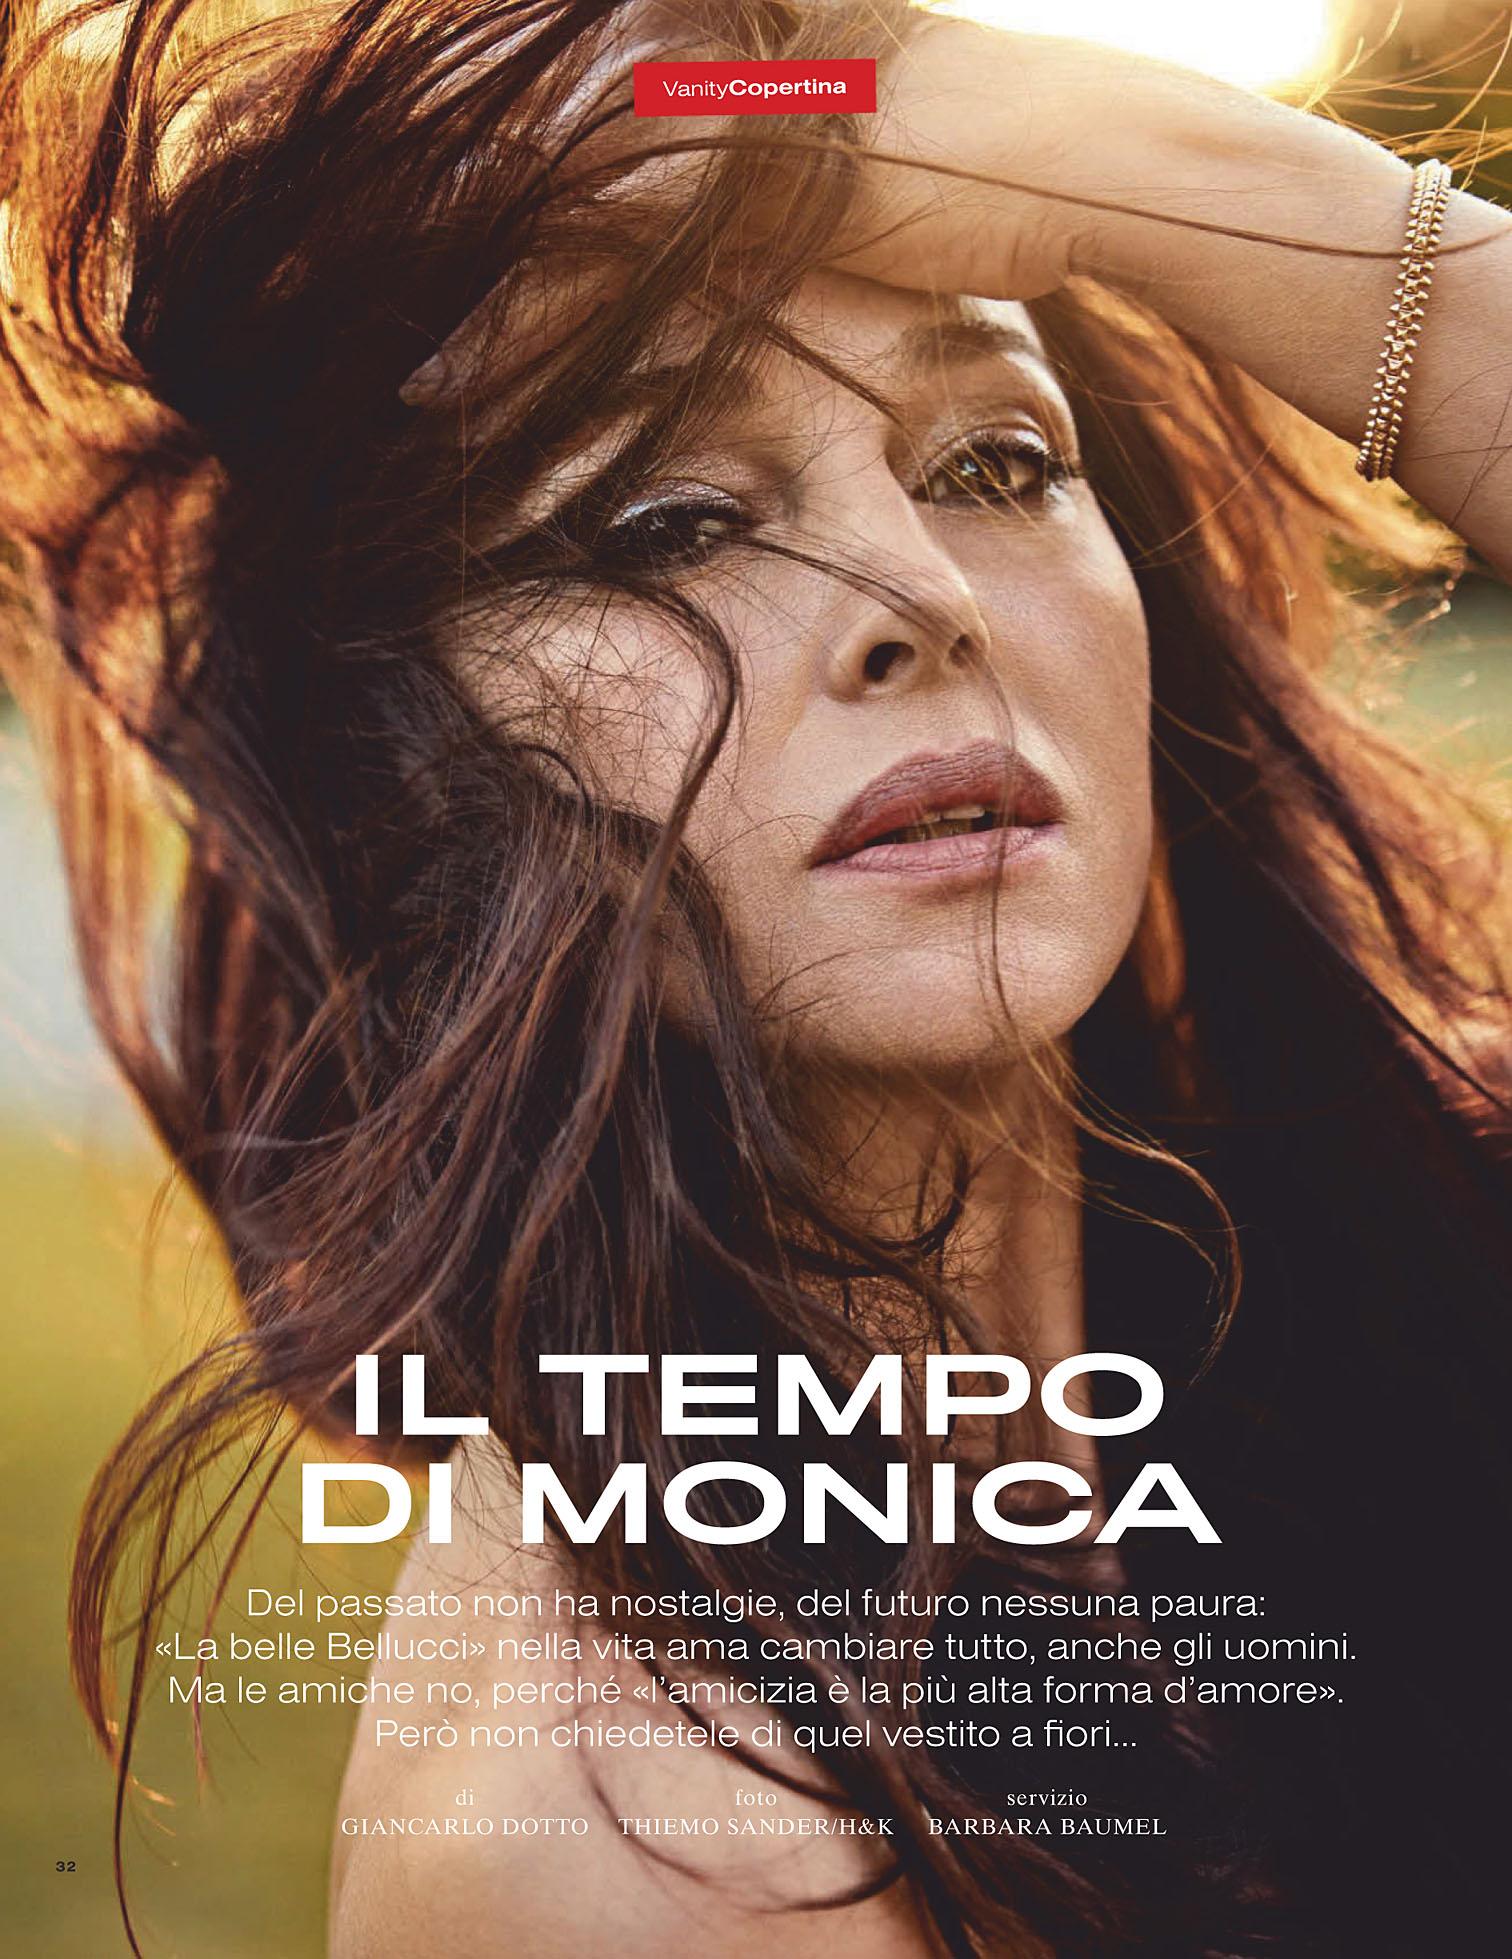 Vanity Fair Italia 2019-08-28 MBellucci2.jpg